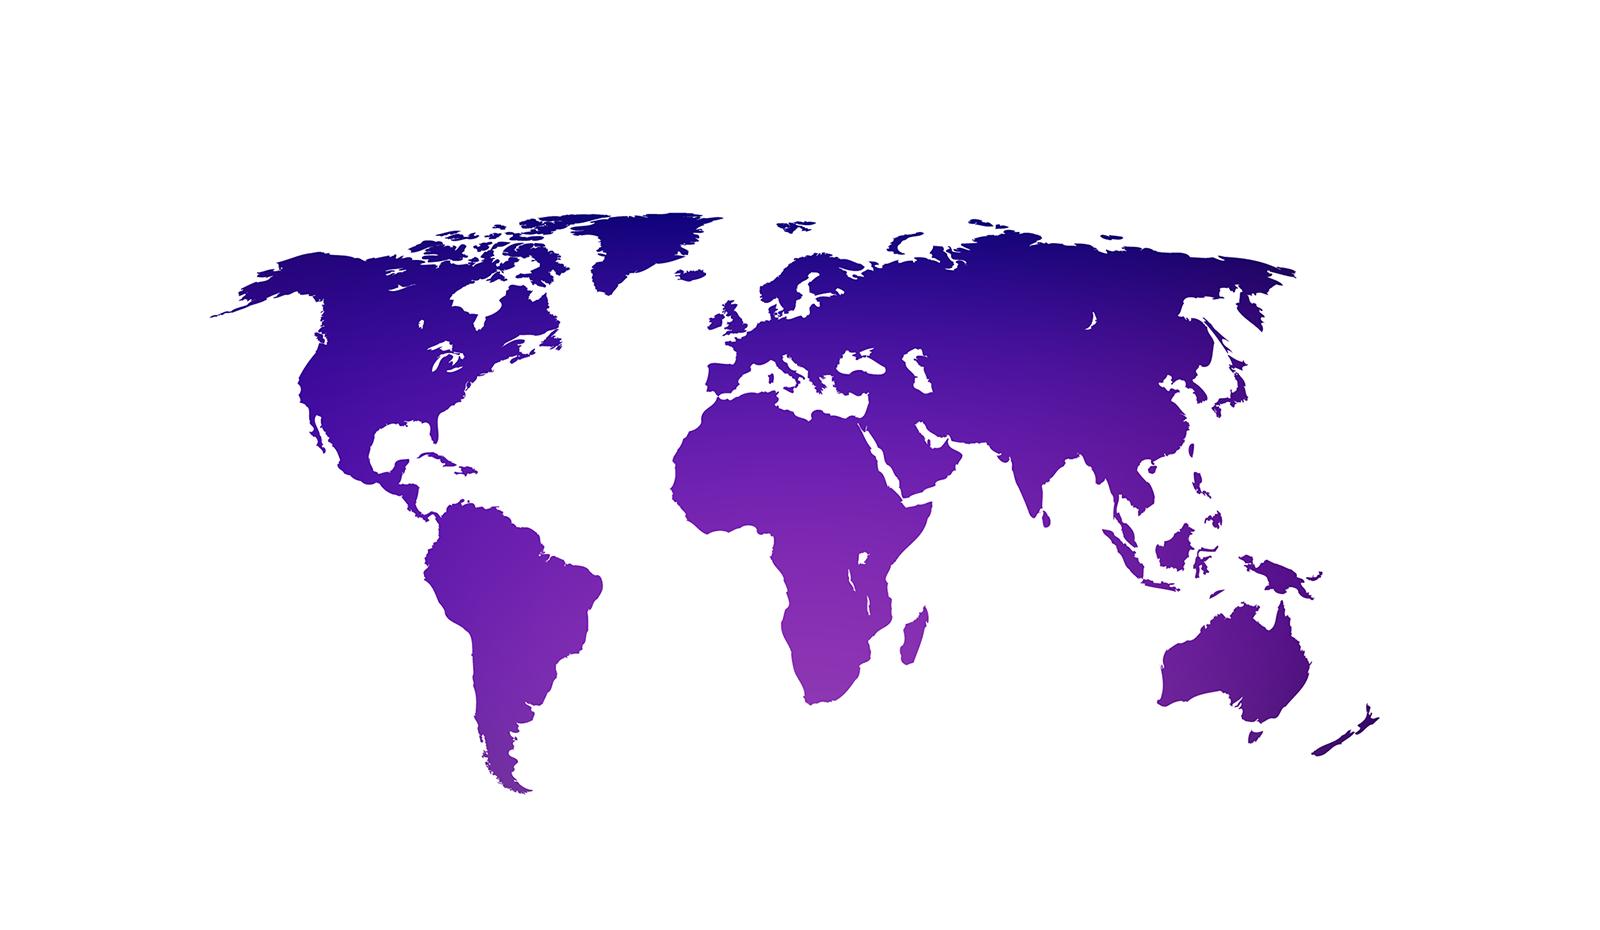 Technicolor Supply Chain Solutions & Logistics